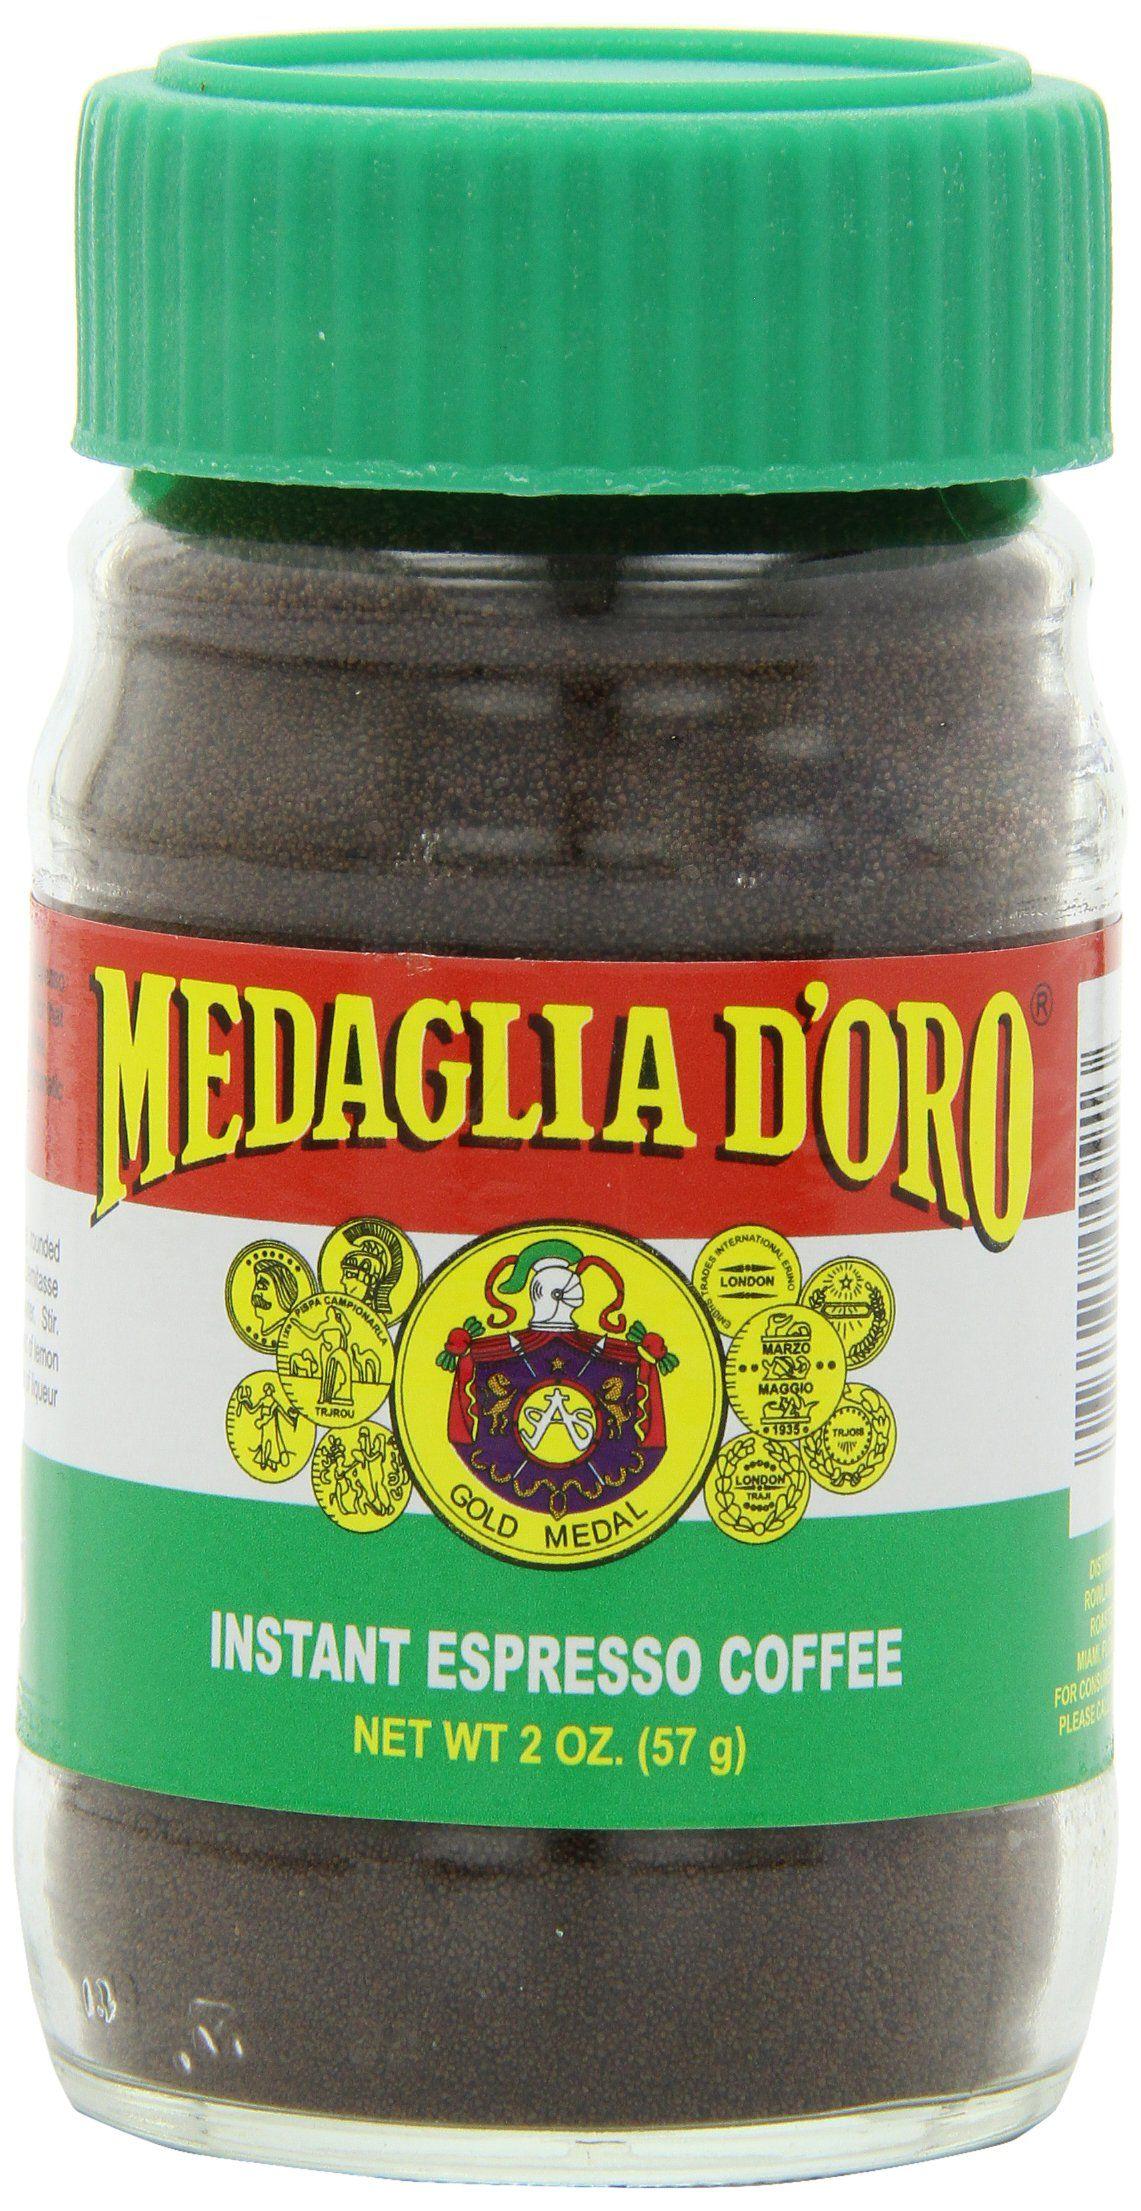 Medaglia doro instant espresso coffee 2 ounce pack of